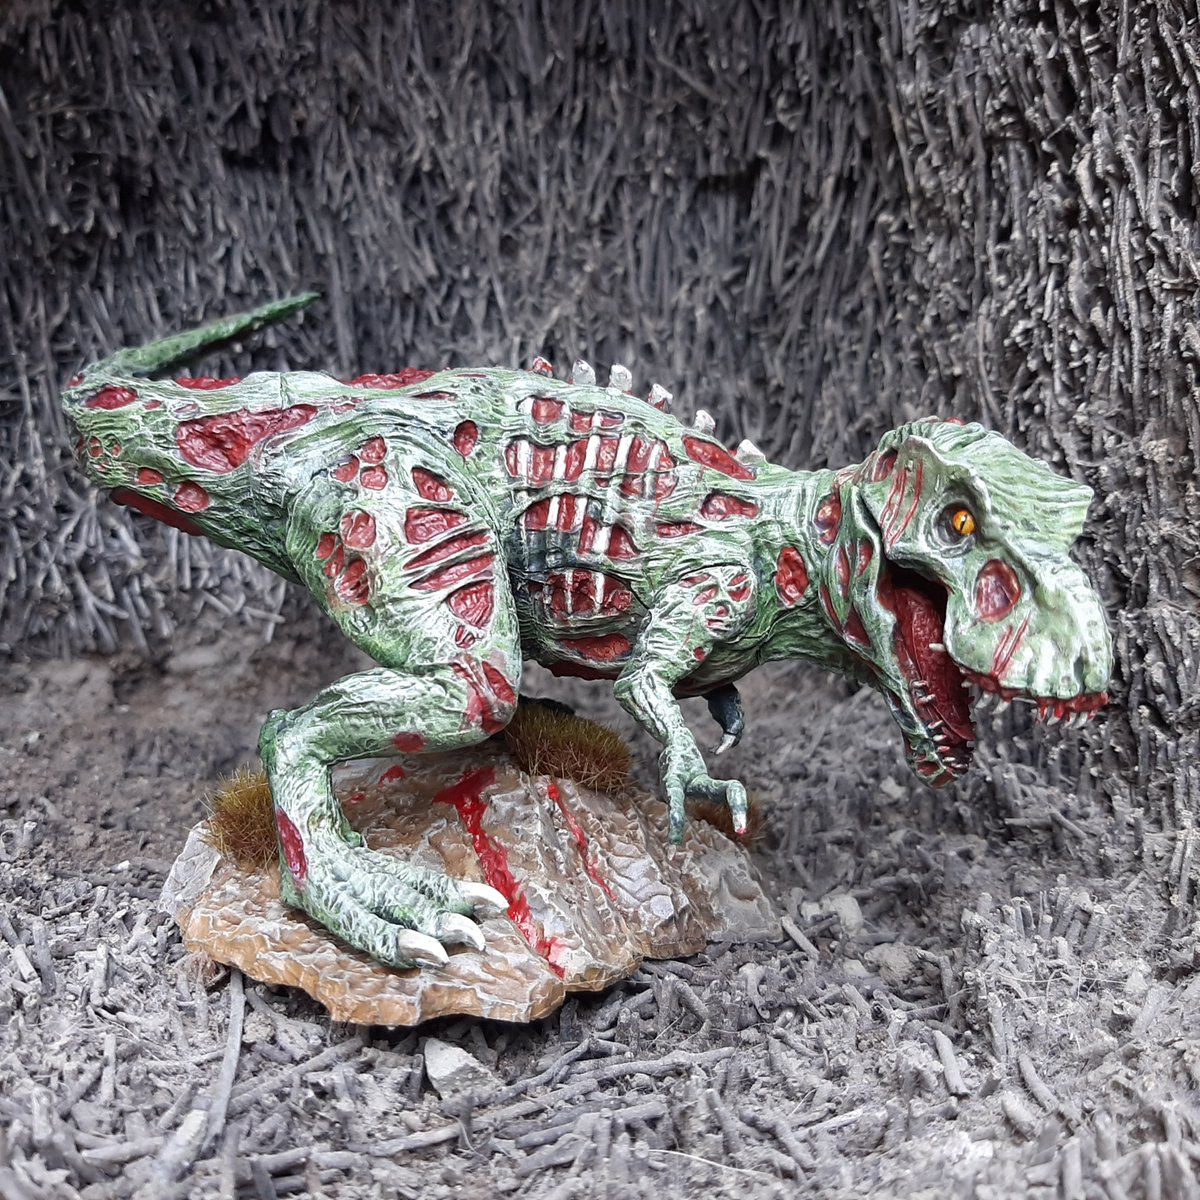 Tyrannosaurus Zombie  #dnd5e #dungeonsanddragonsmini #zombietrex #tombofannihilation #galeforcenine #galeforce9 https://t.co/eFCTkriZTC